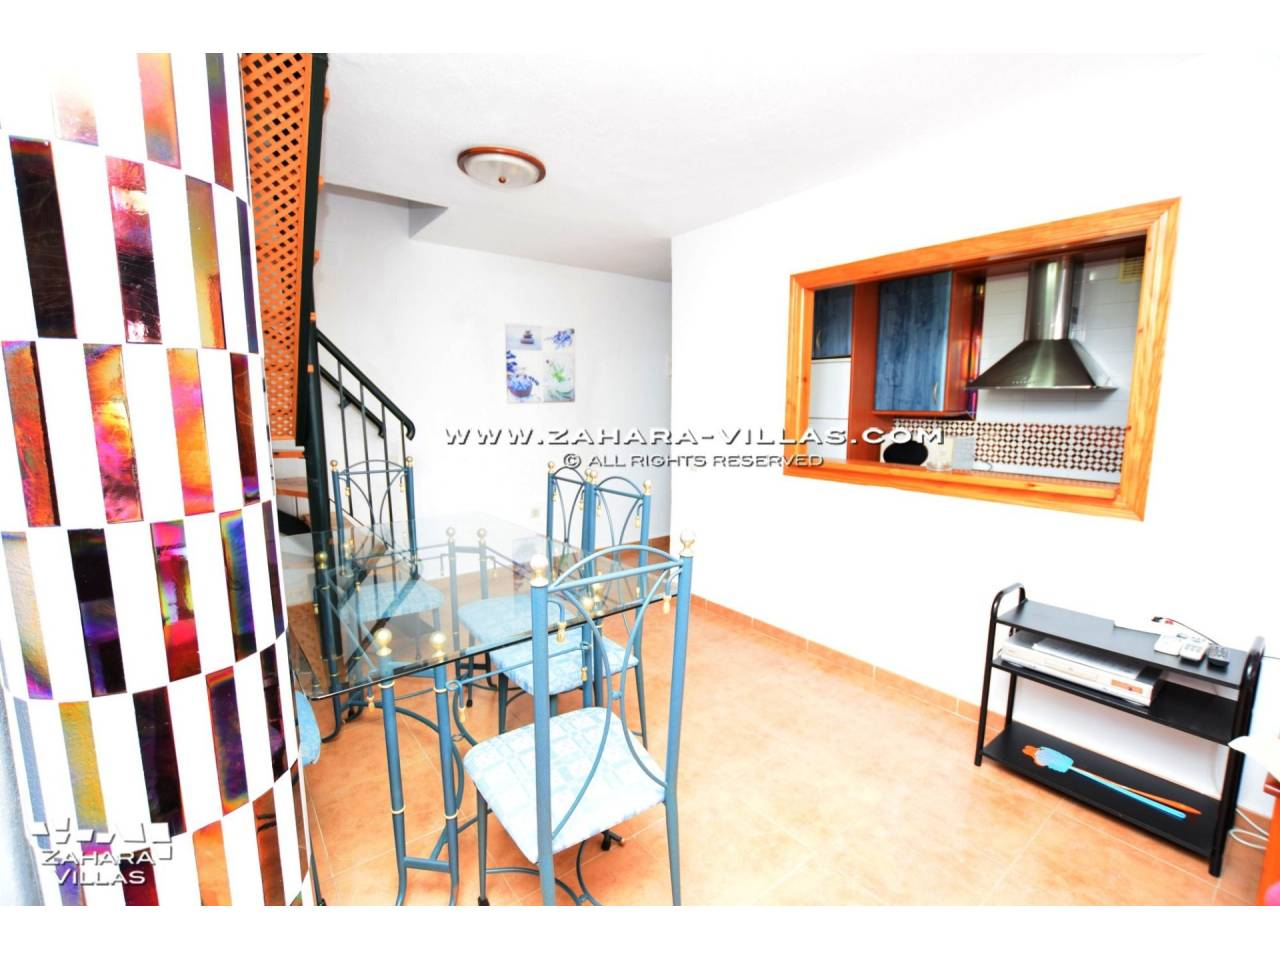 Imagen 15 de Penthouse for sale in Zahara de los Atunes